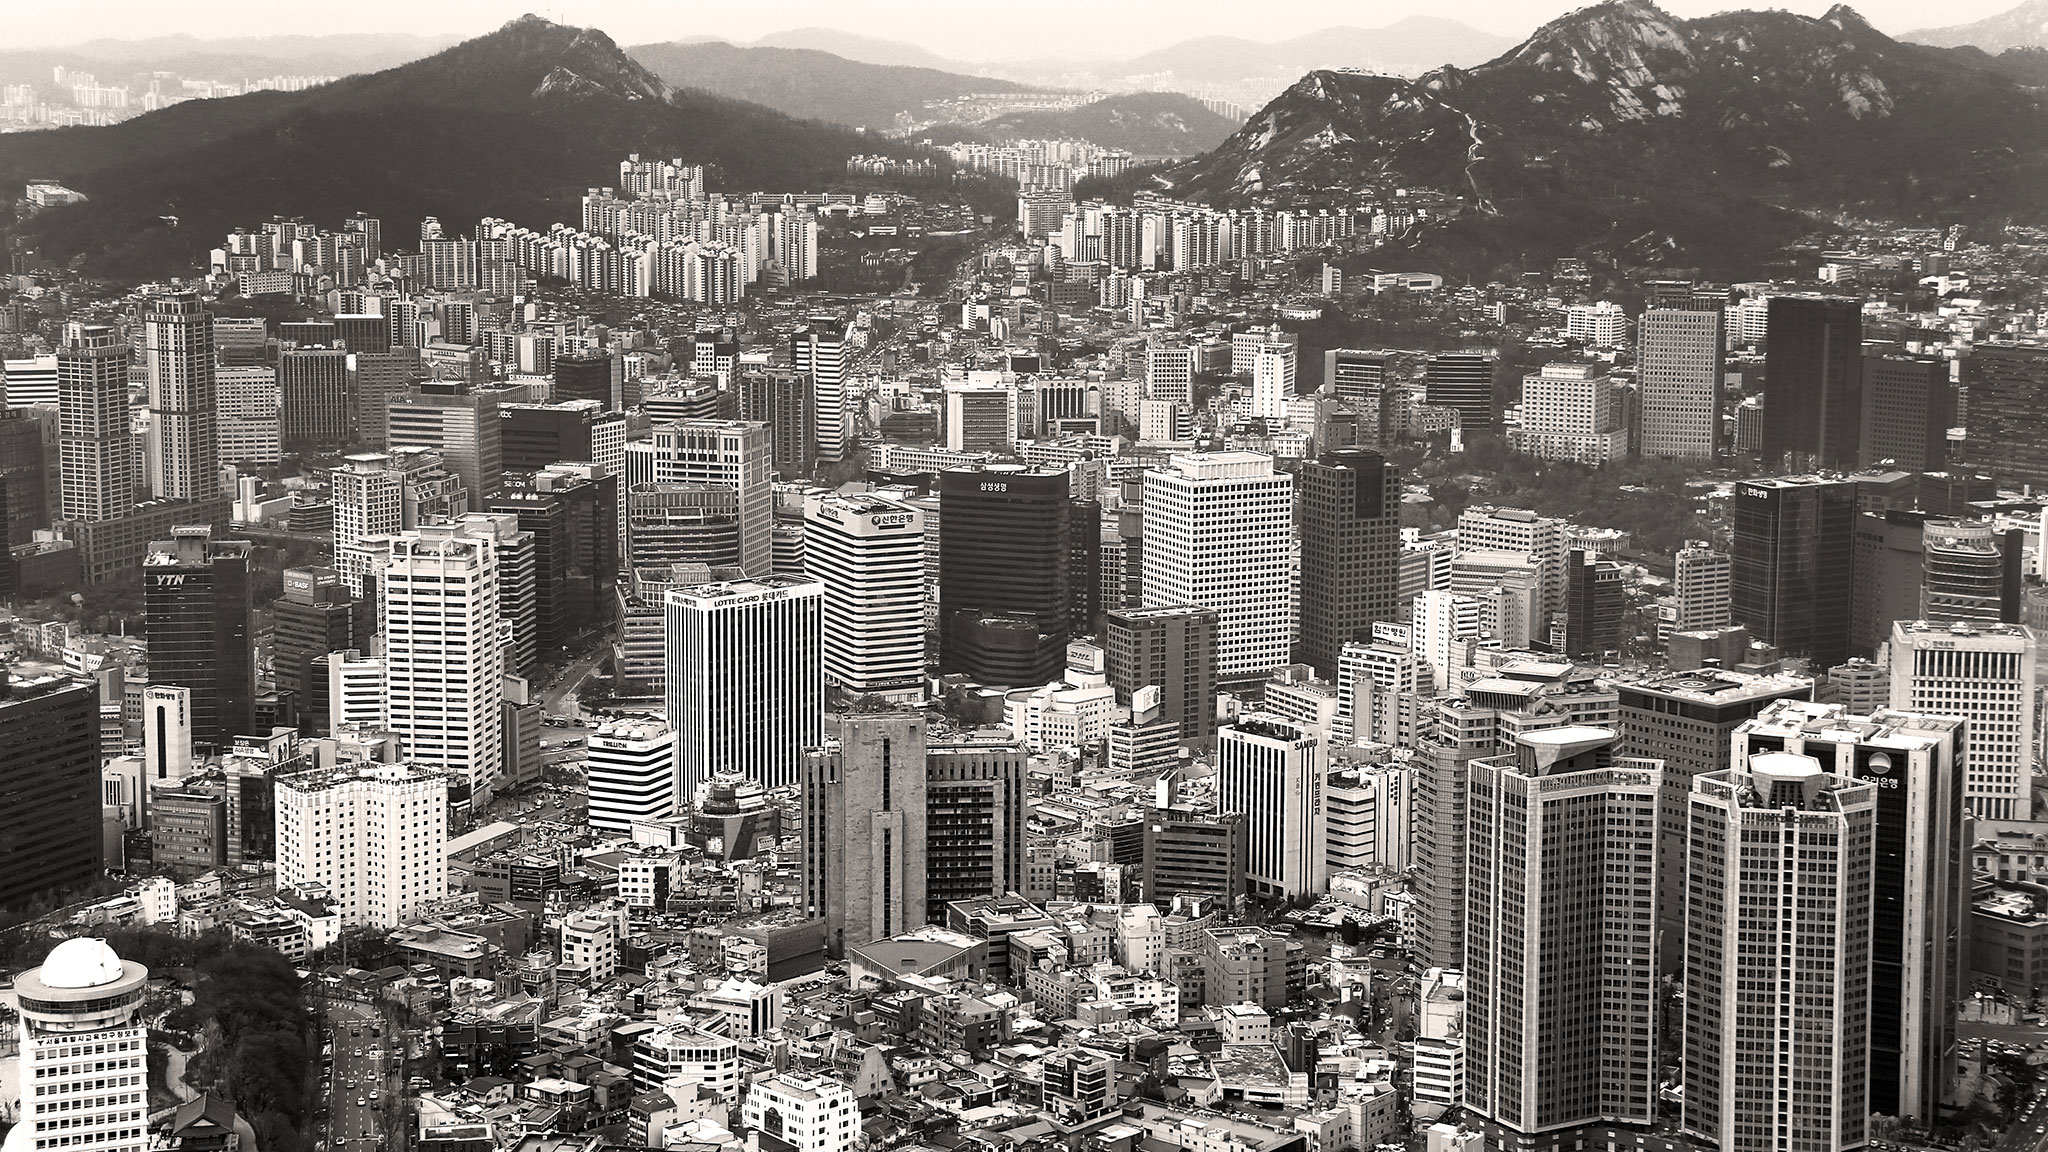 Seeing Seoul